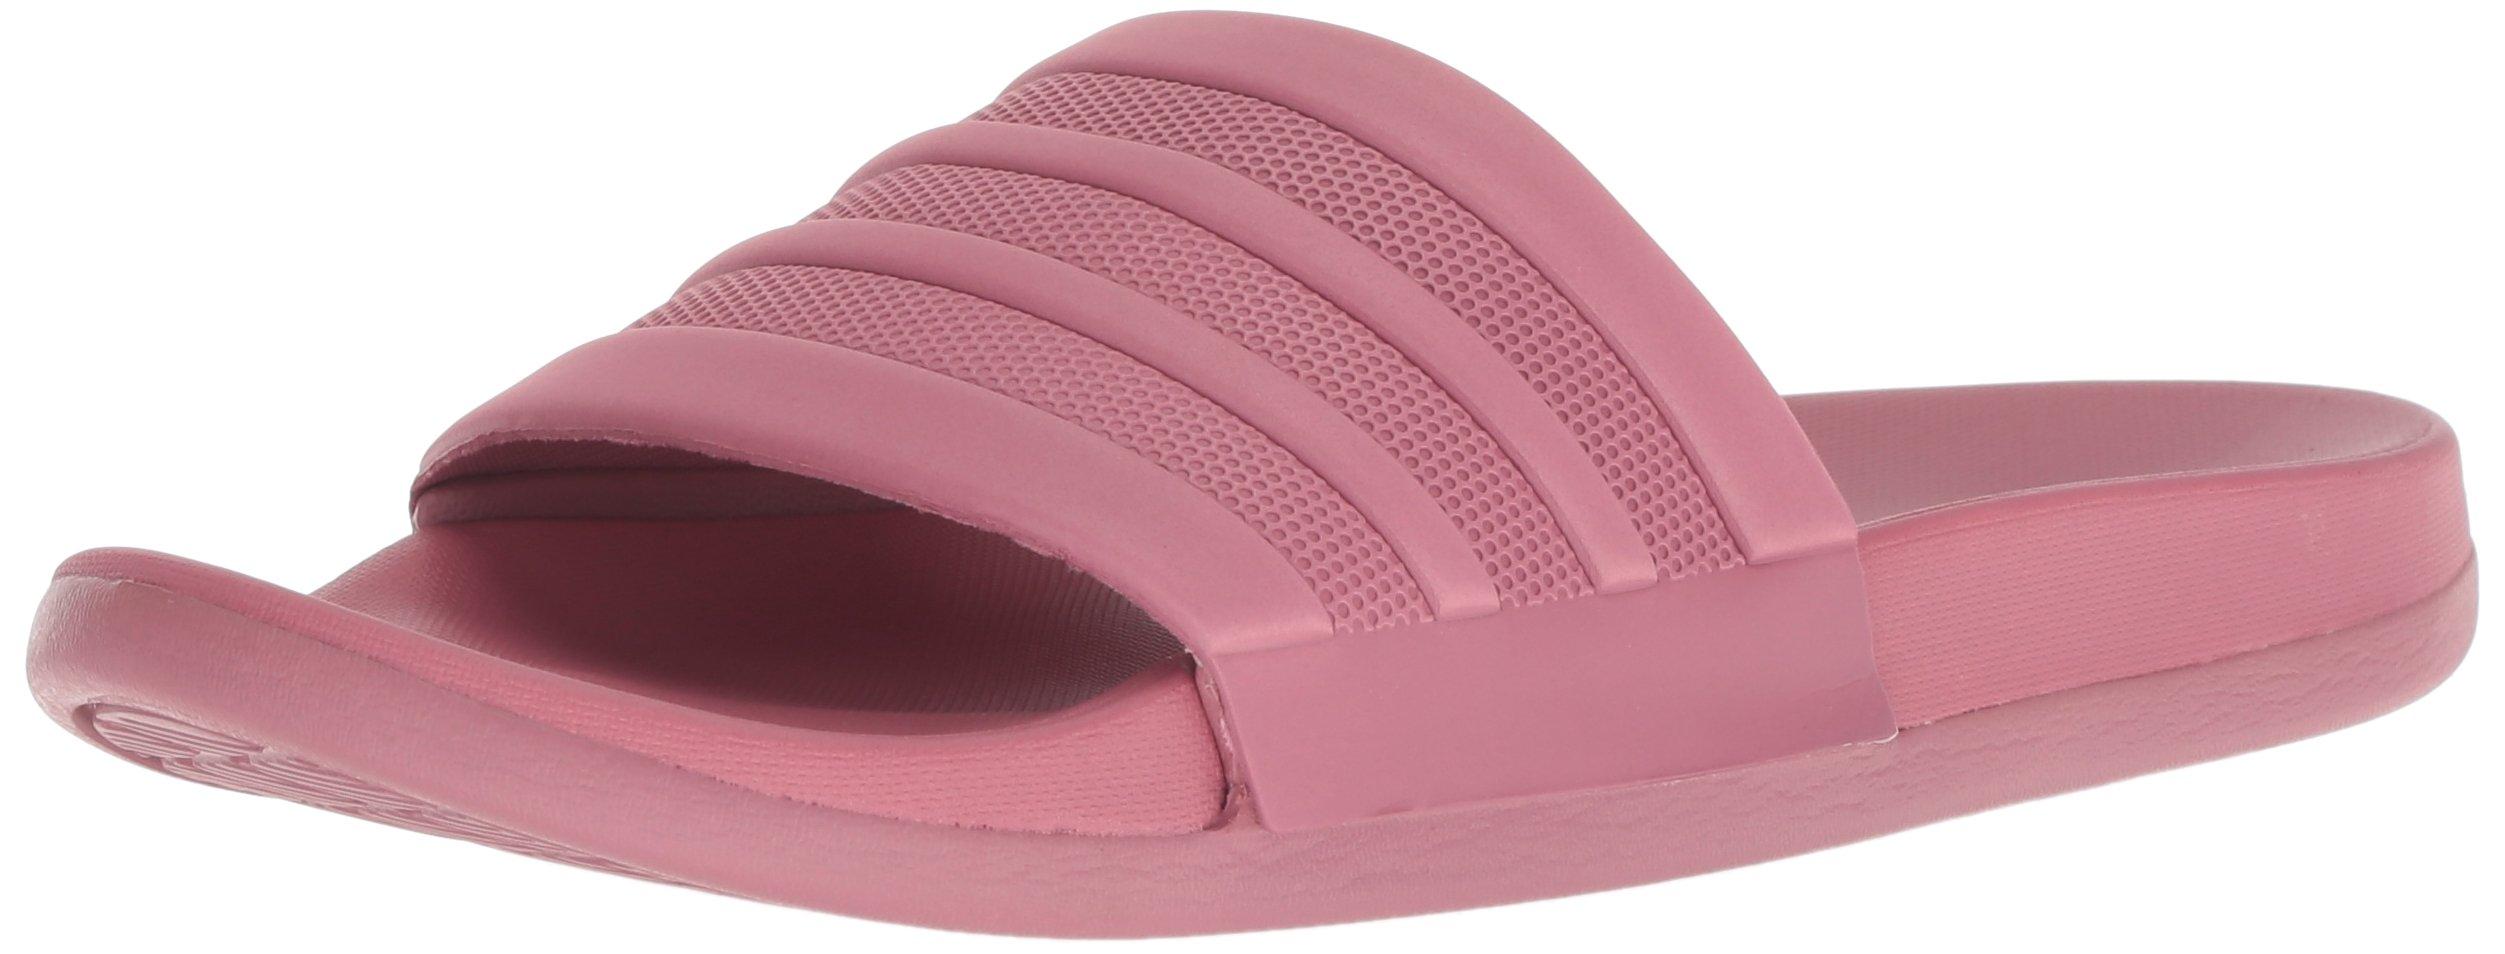 2c6def07cb4 adidas Women s Adilette CF+ Logo W Slide Sandal - 121   Sport ...